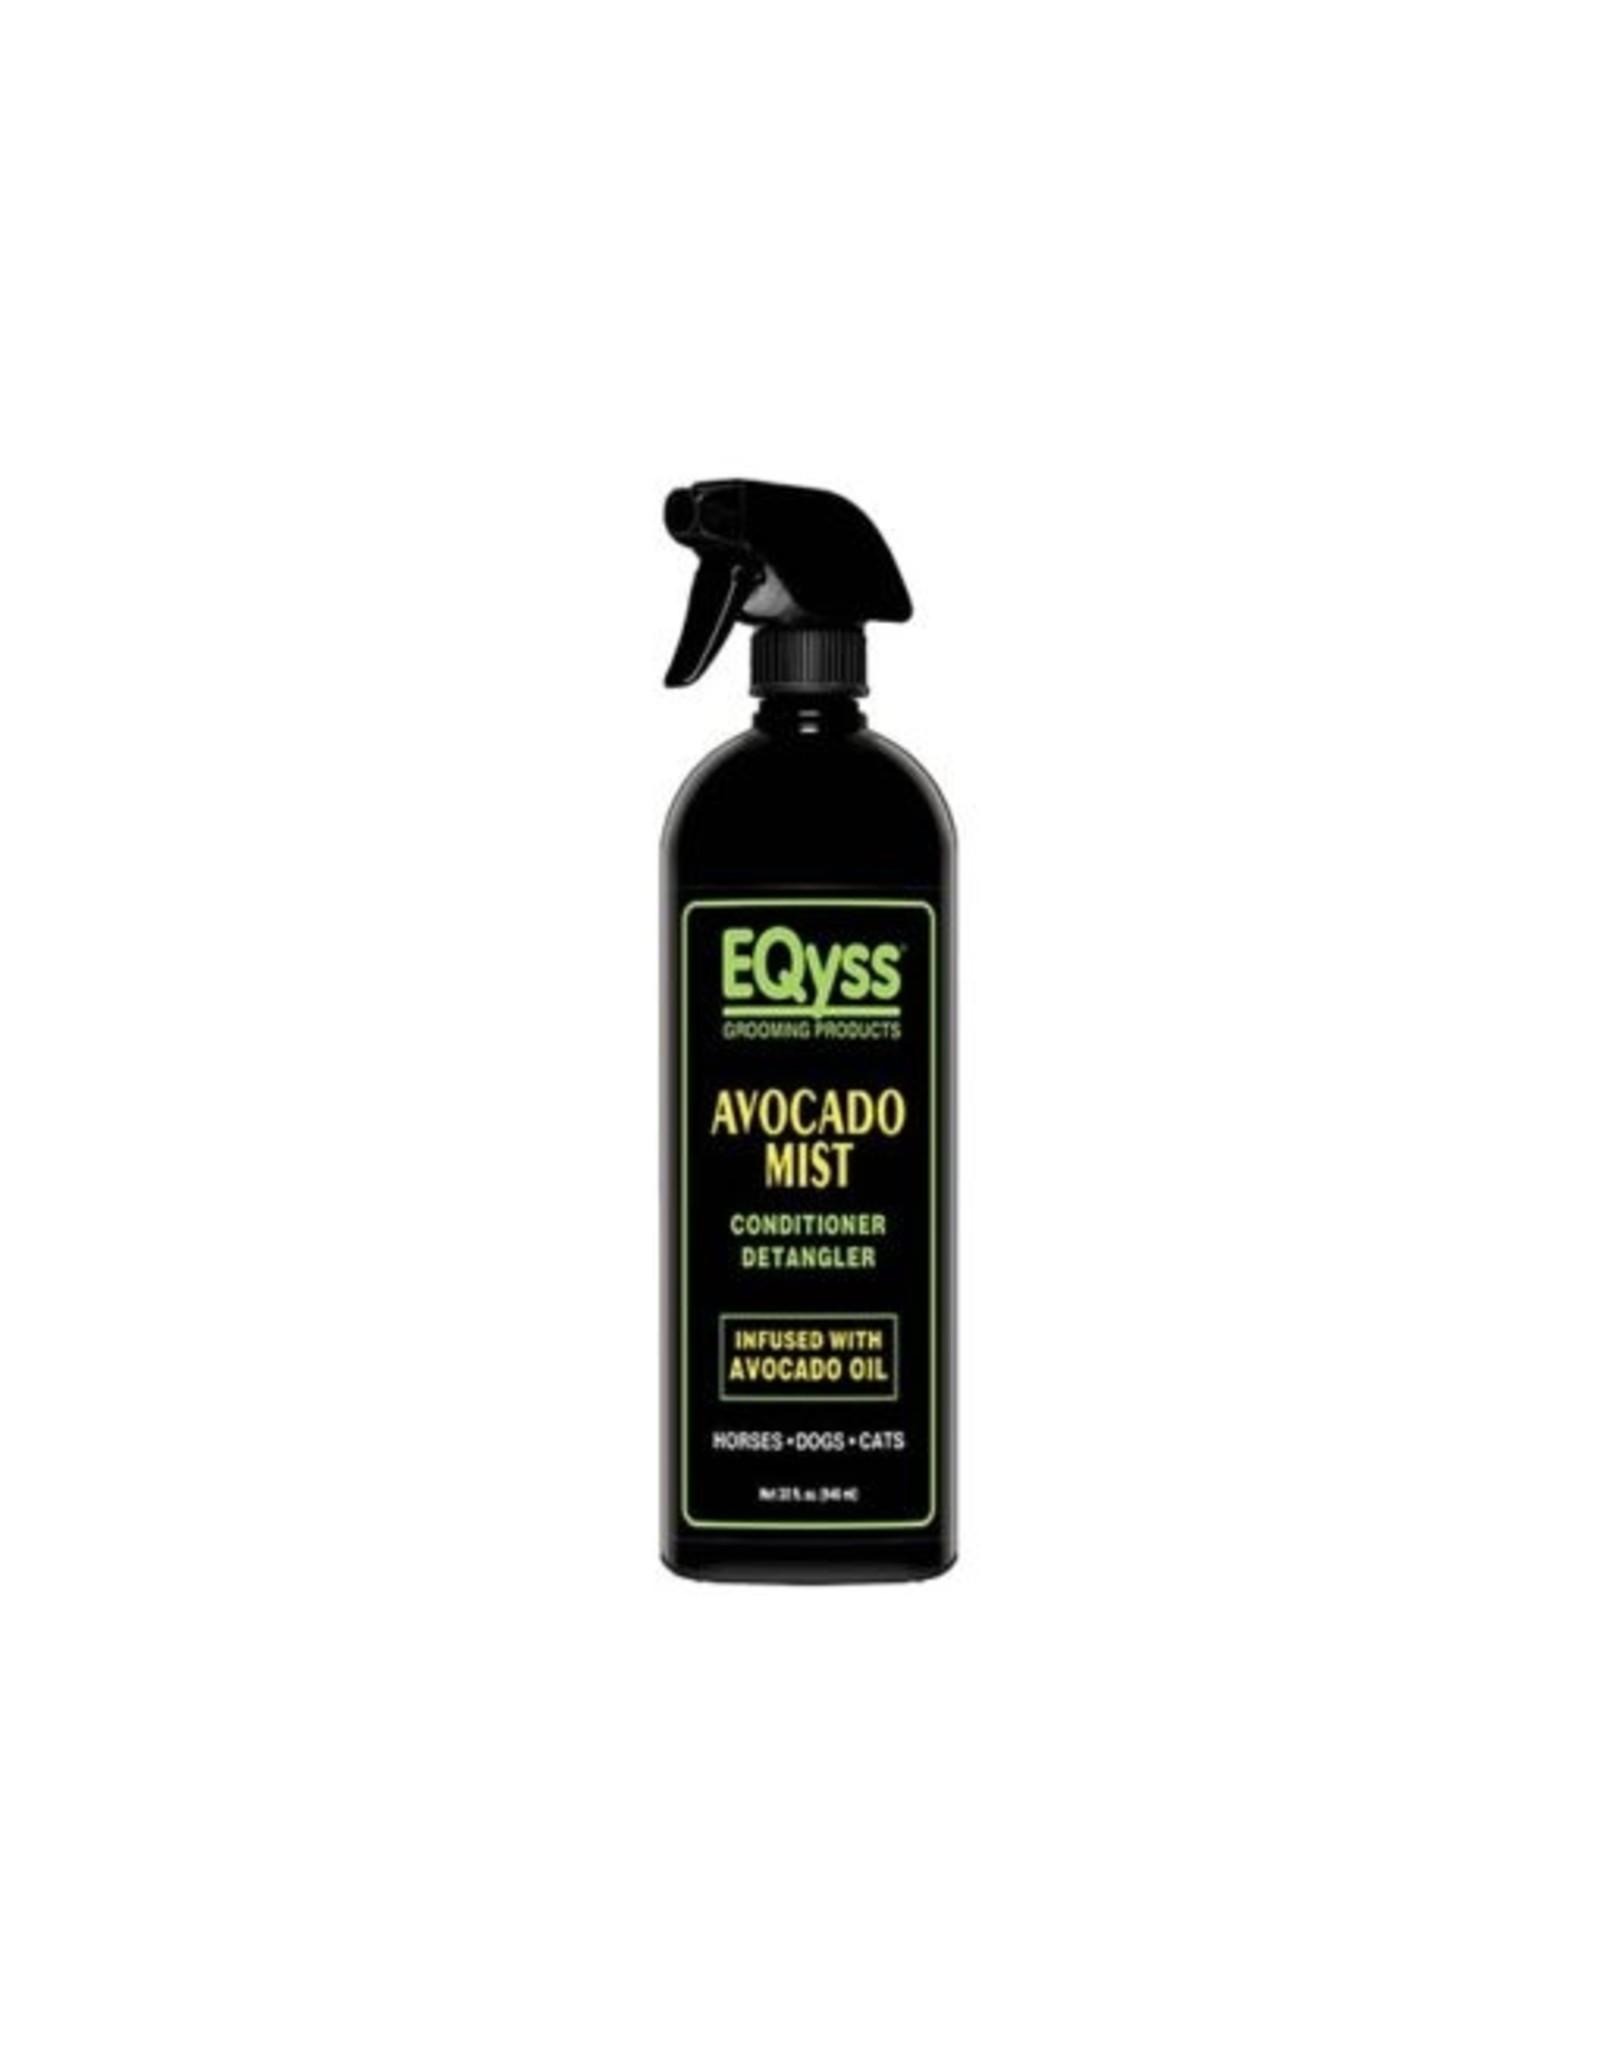 Eqyss Avocado Mist Conditioner Detangler  Spray